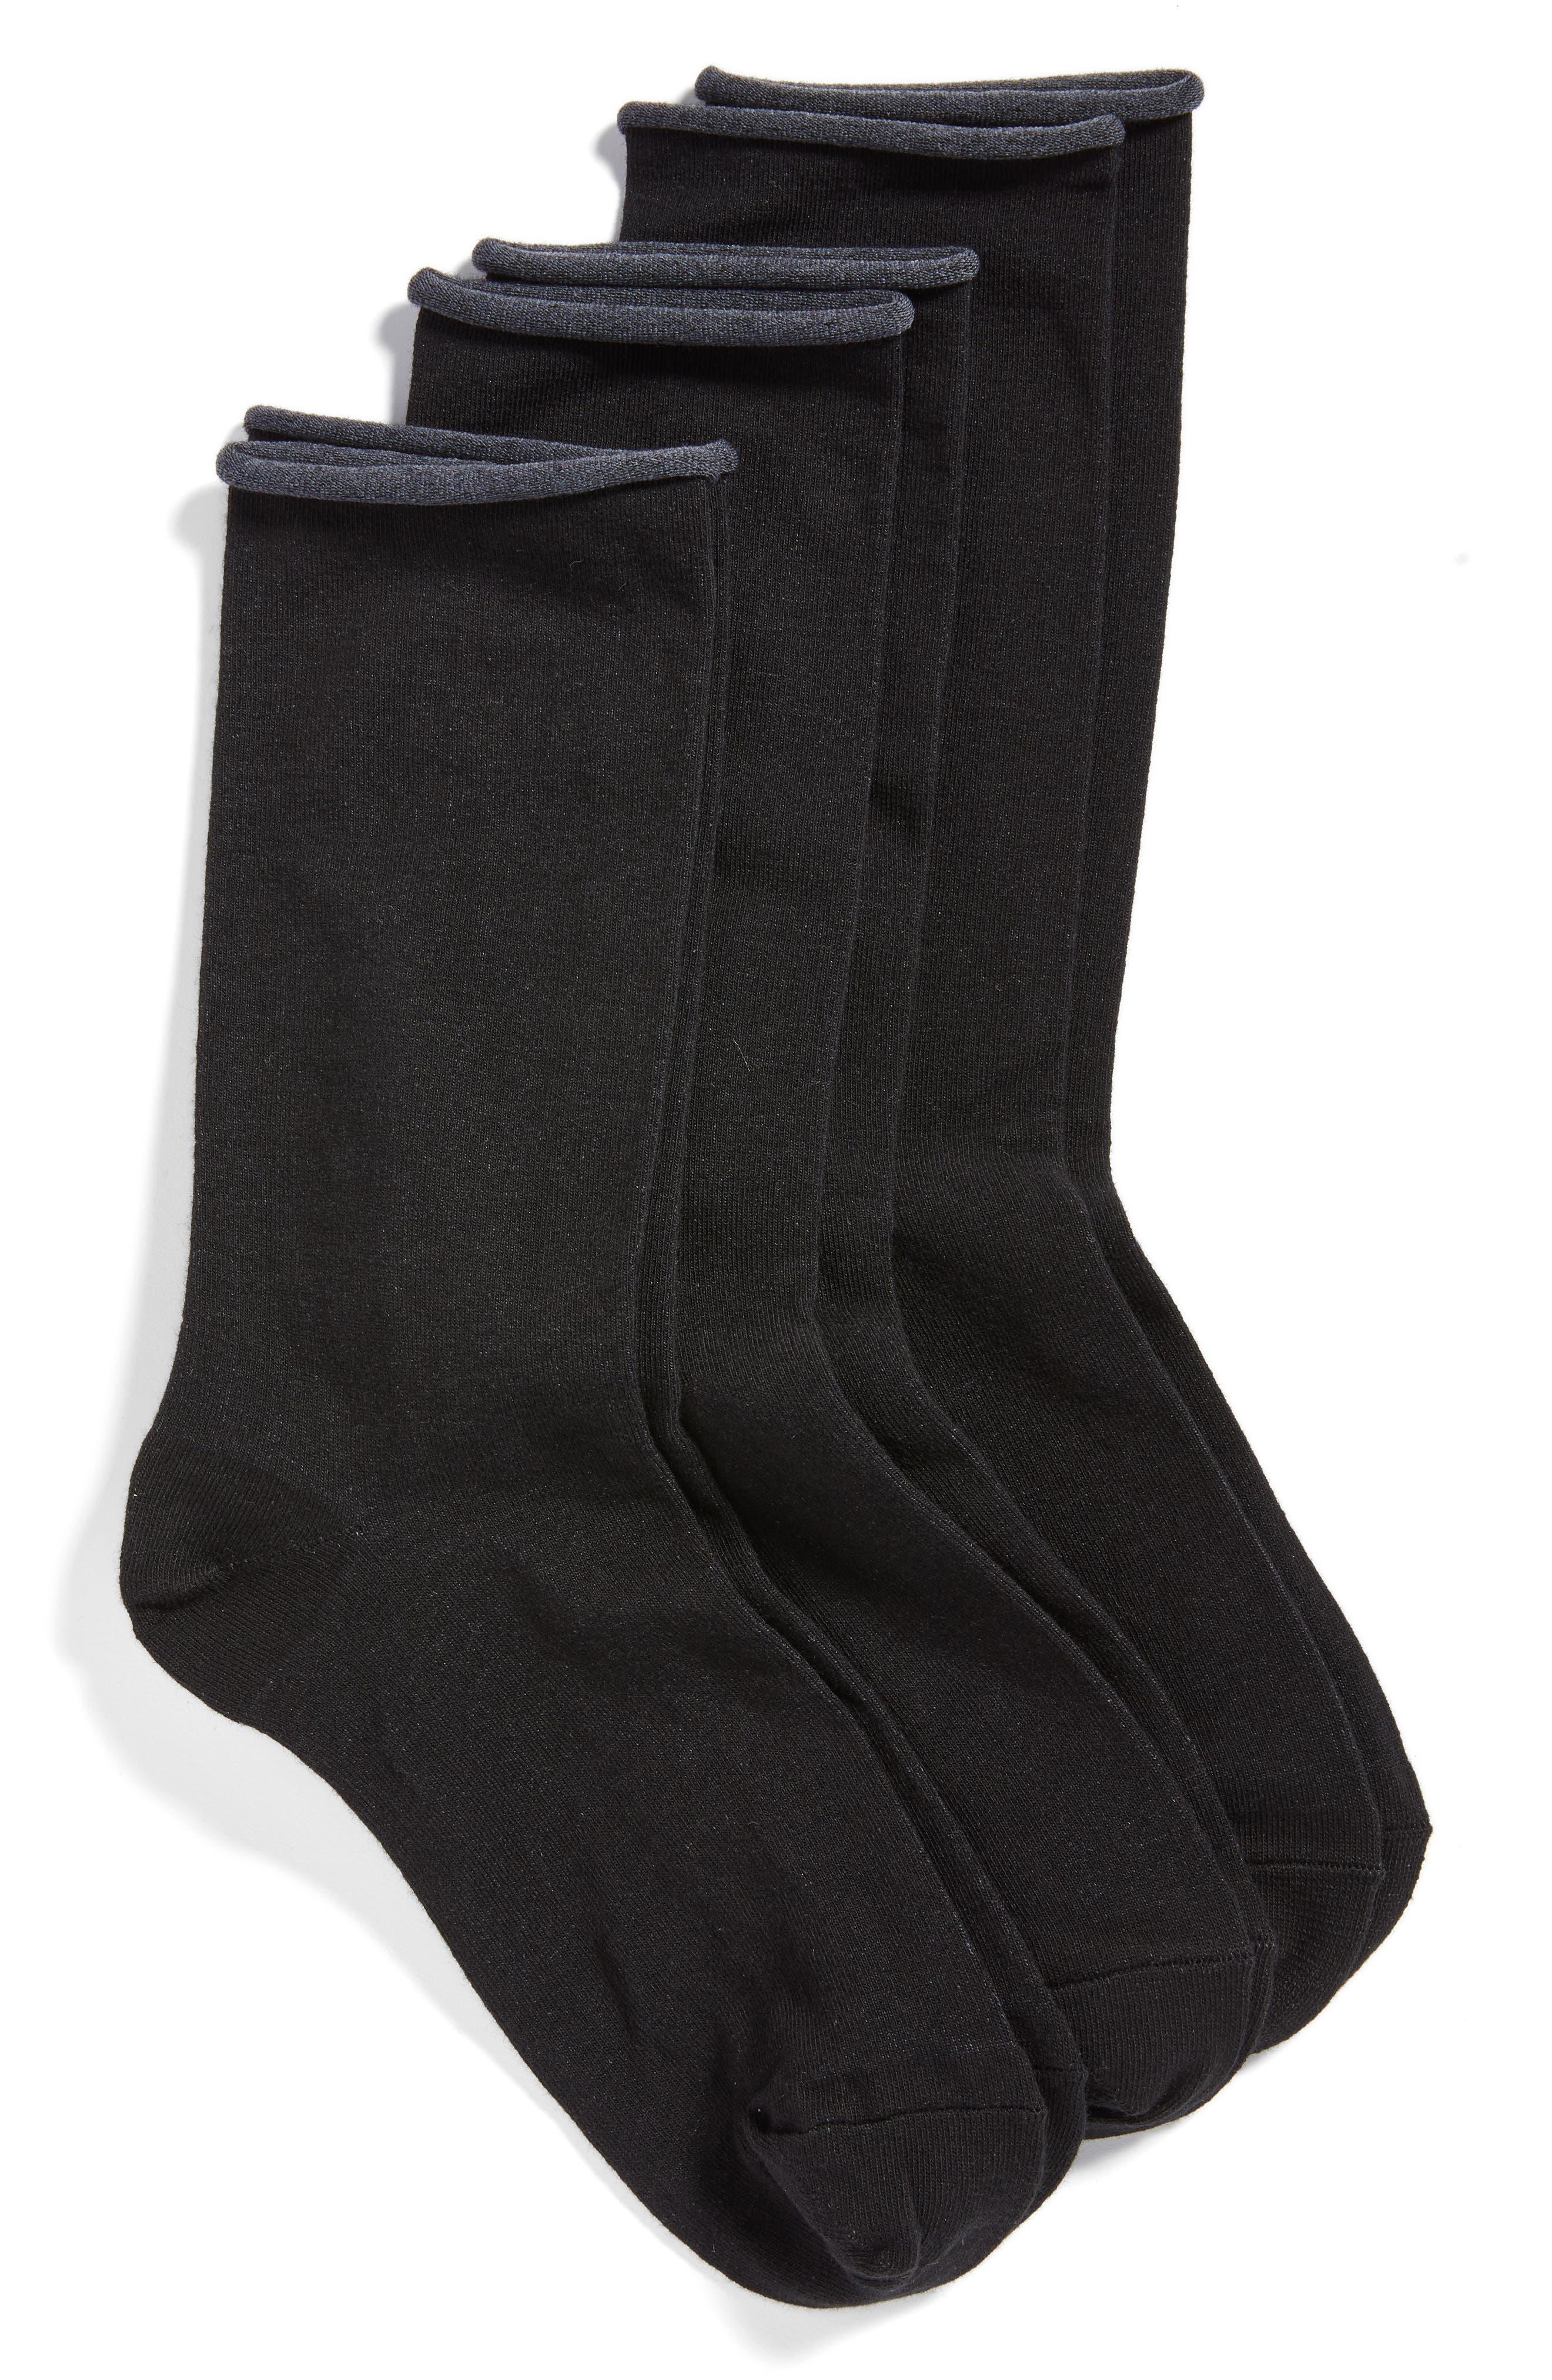 HUE Jeans 3-Pack Crew Socks, Main, color, BLACK